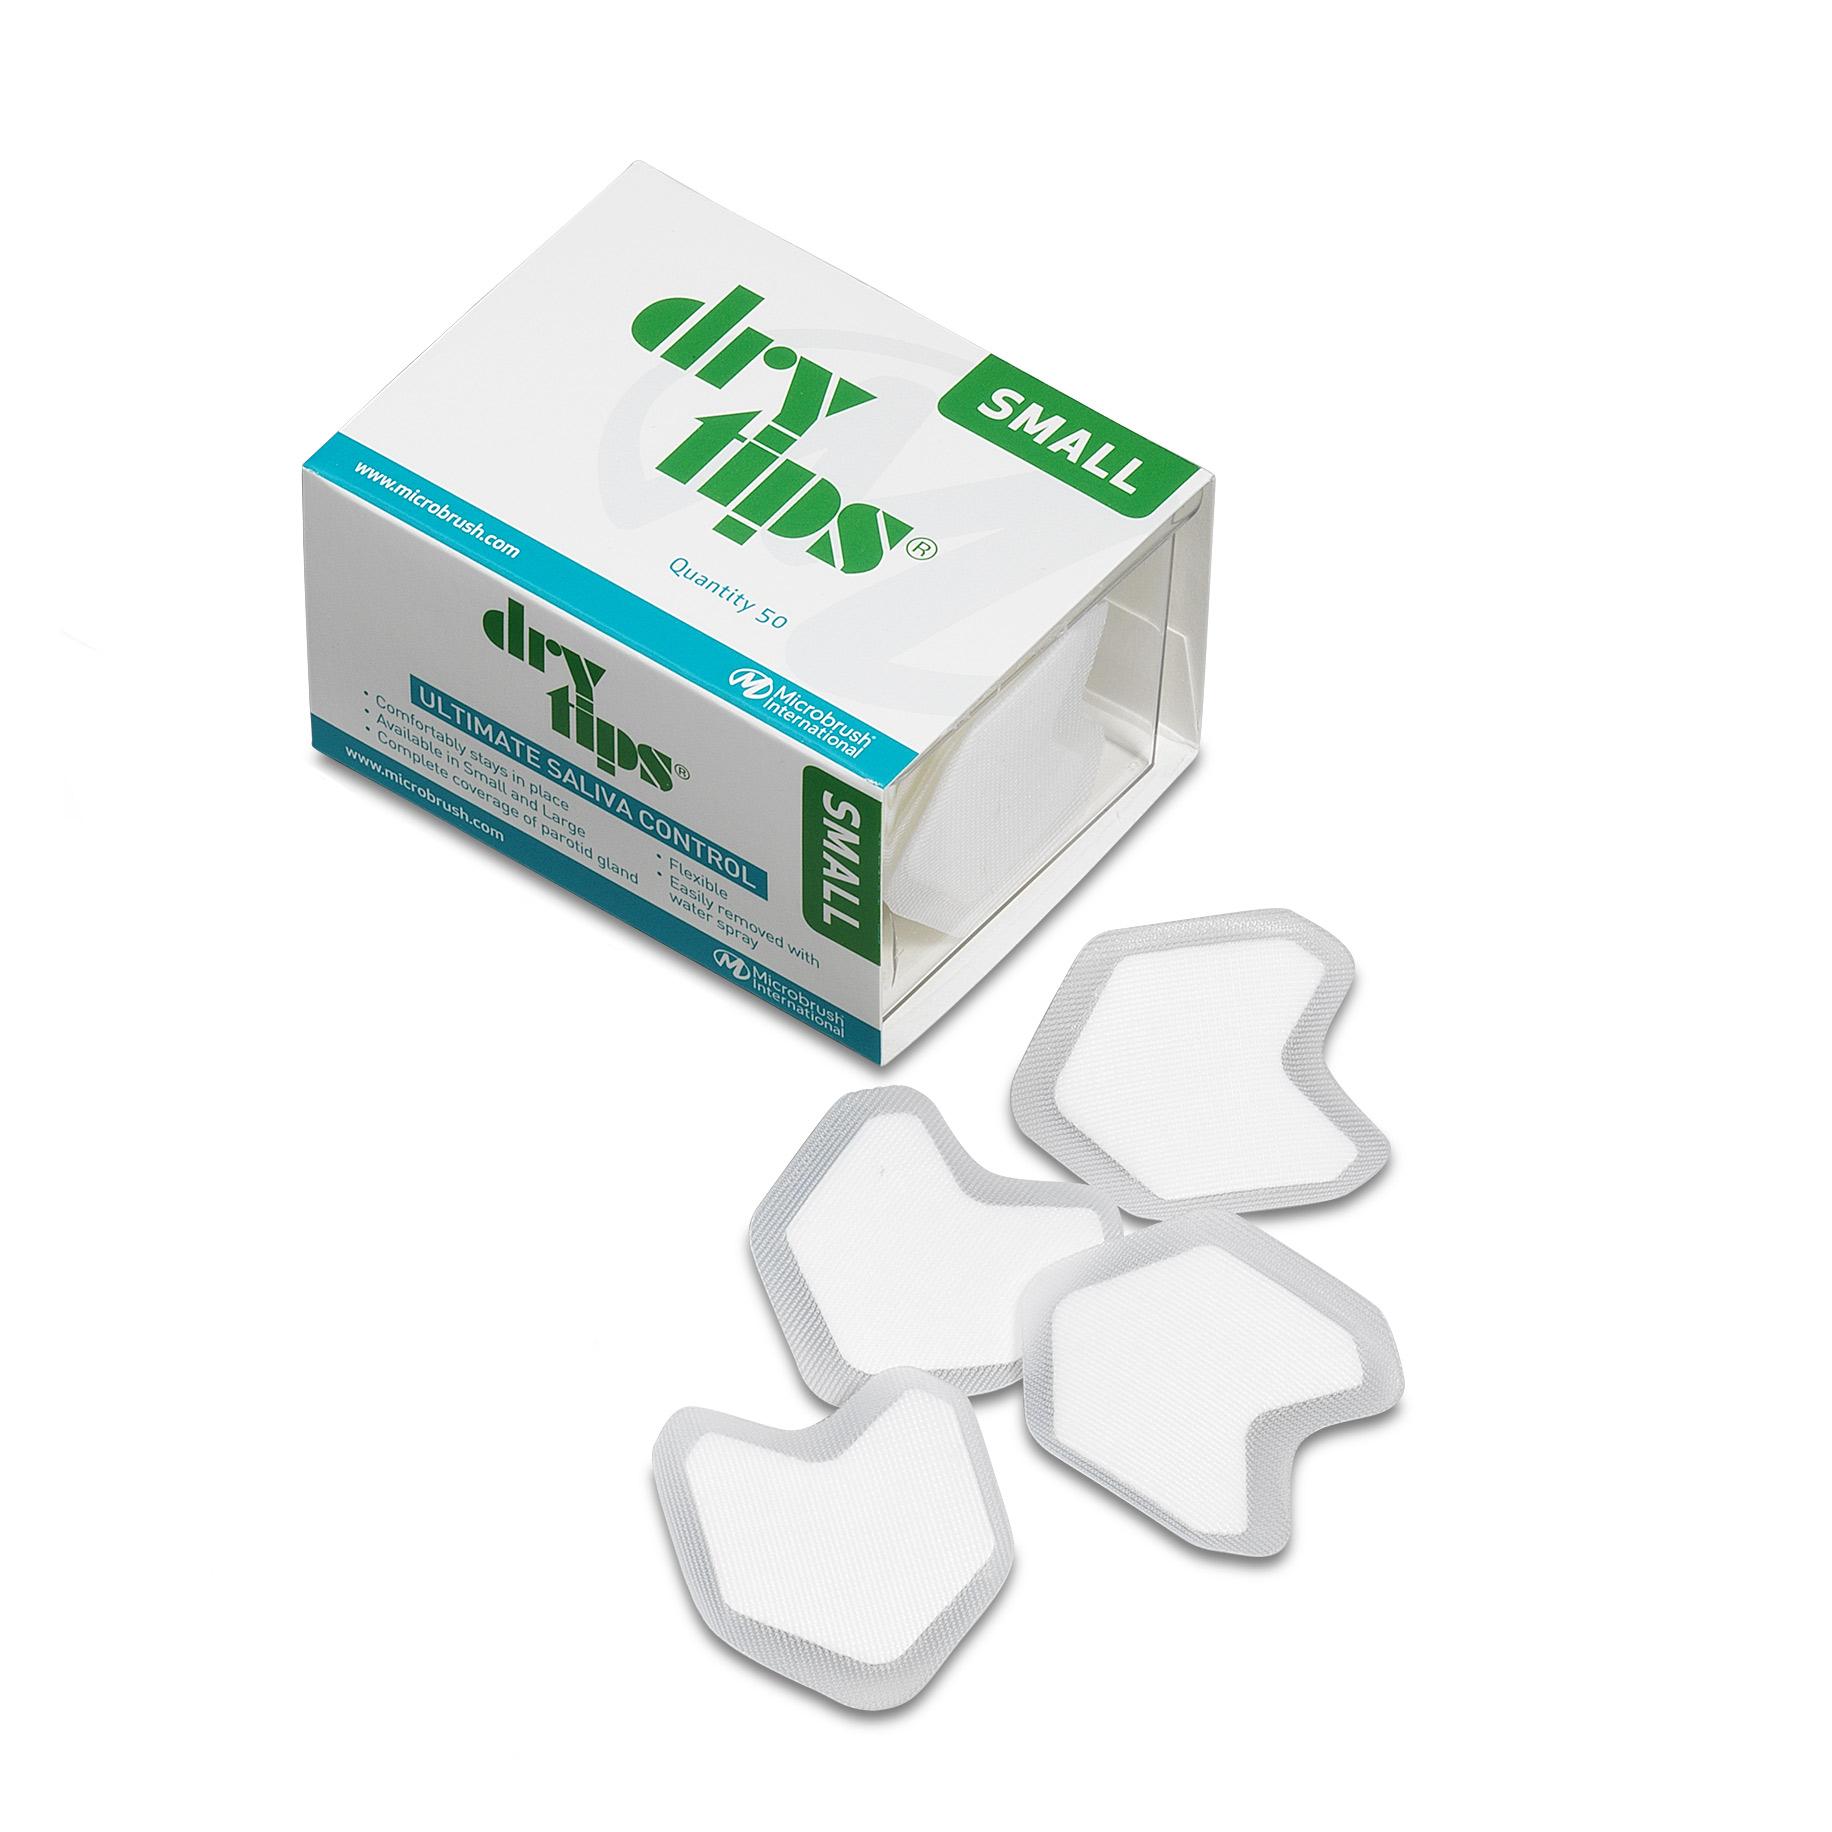 DryTips® (small)